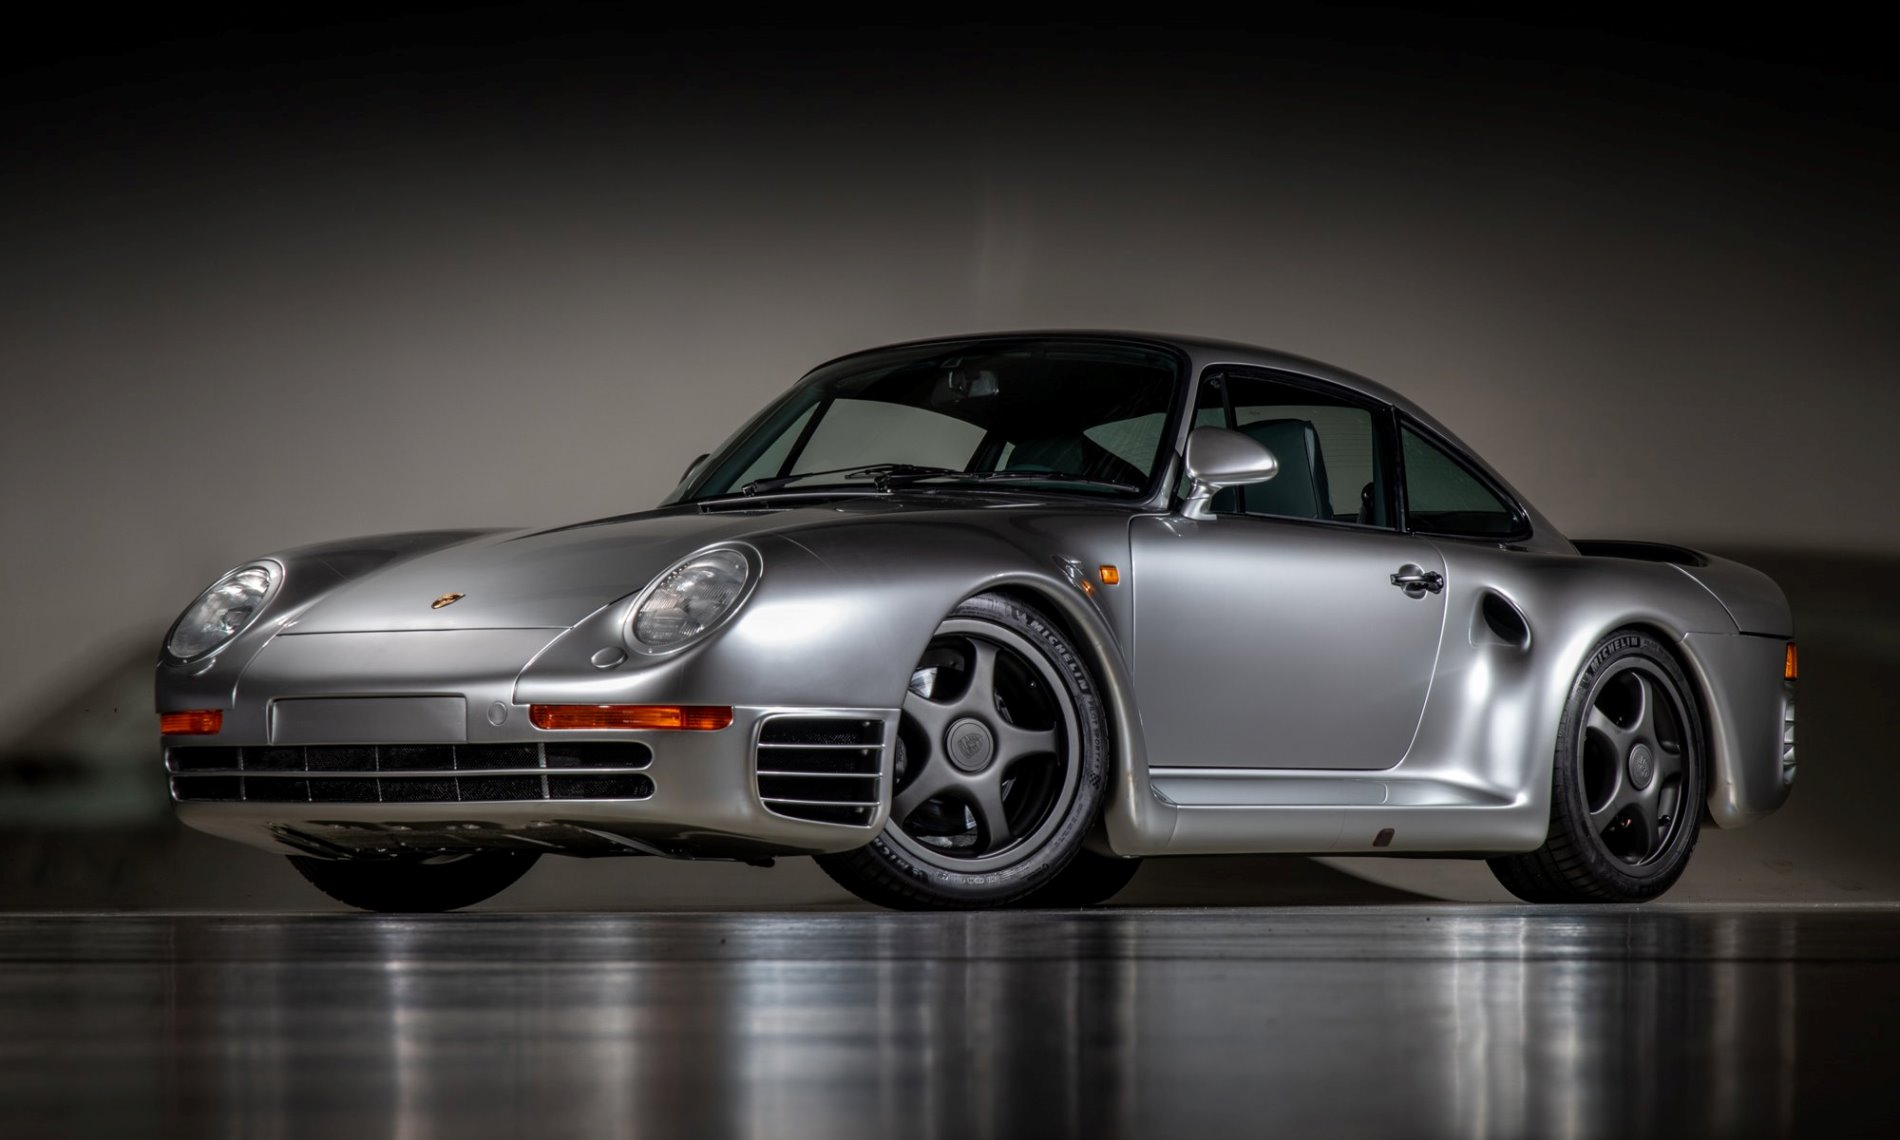 Porsche 959 Reimagined by Canepa grey